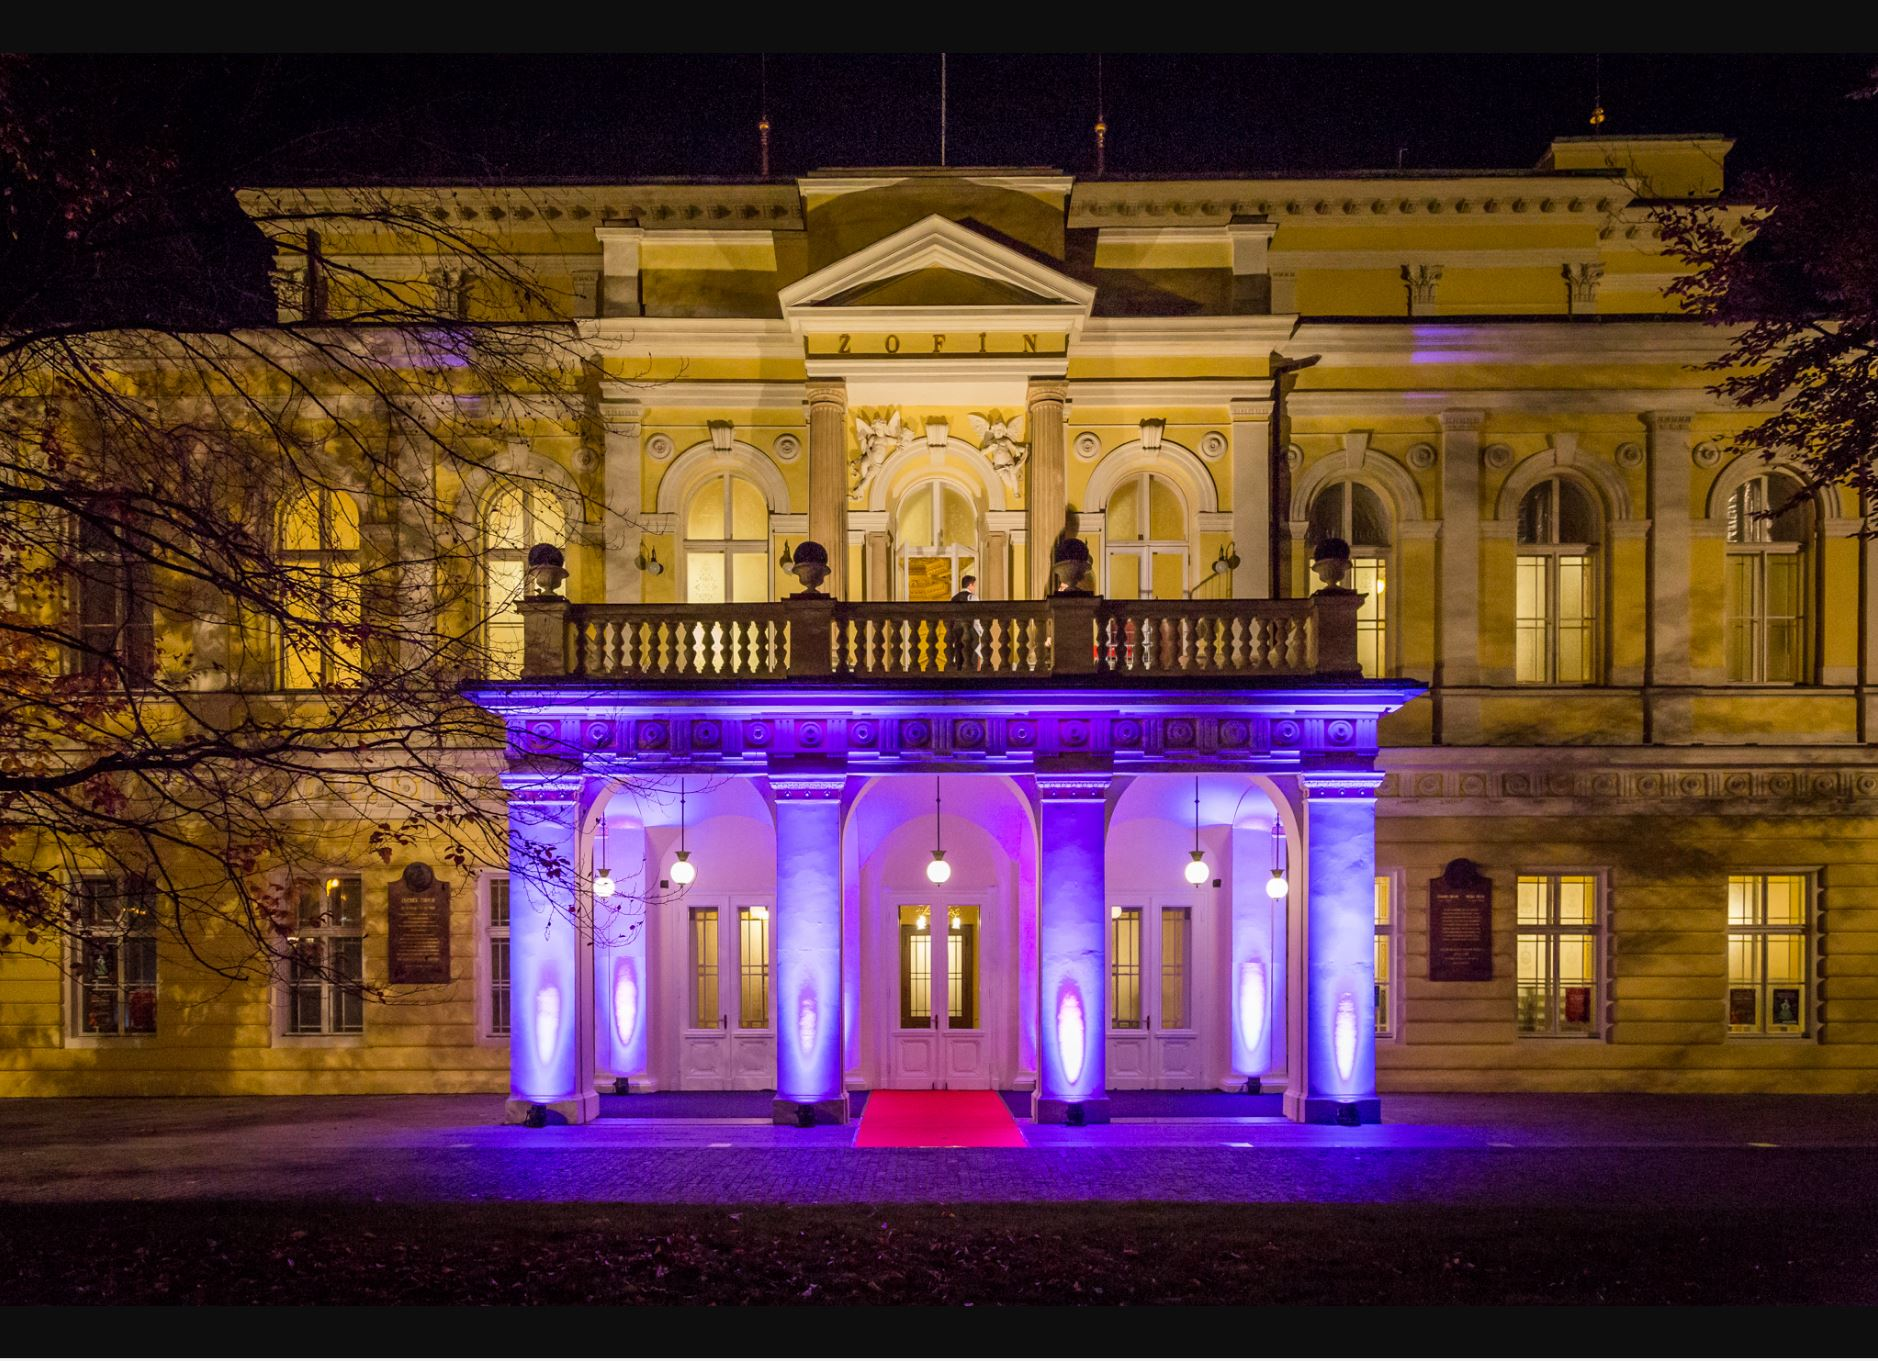 Žofín Palace - Prague, Czech Republic - Jeannine Goeckeritz.JPG